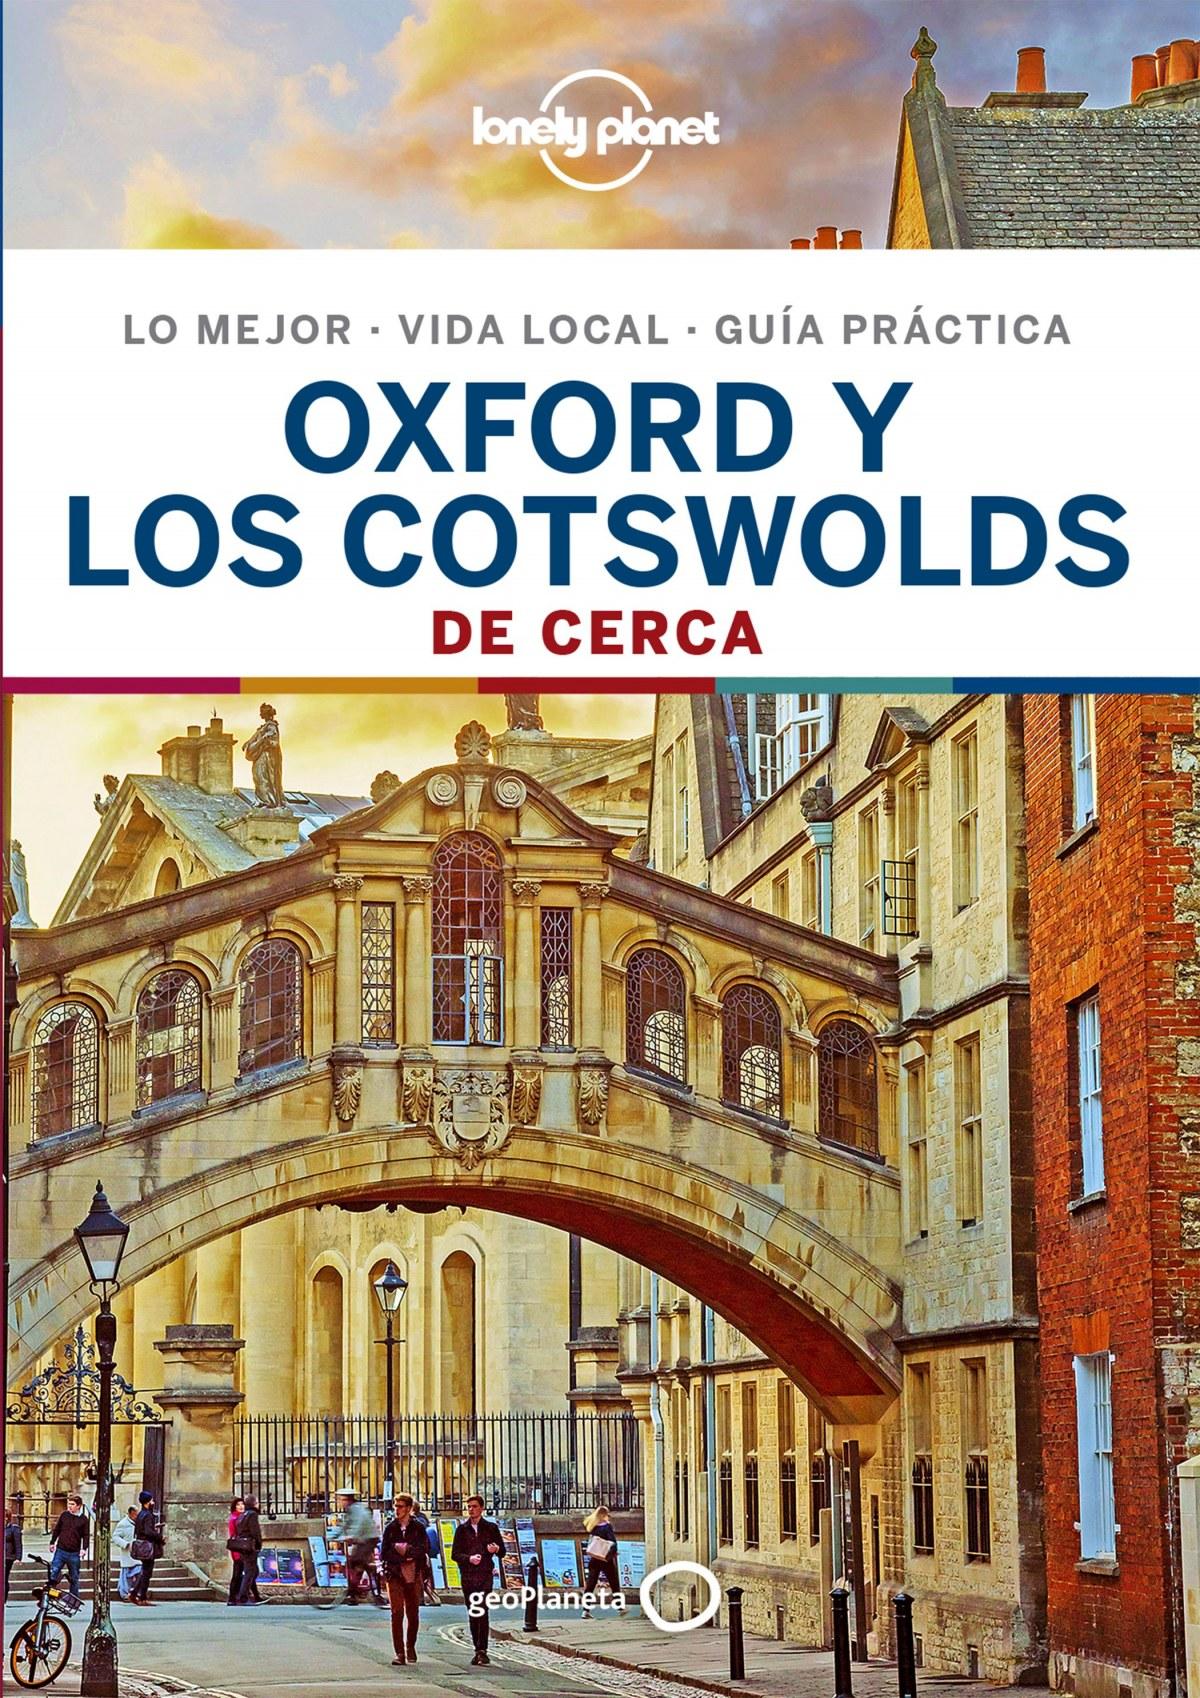 OXFORD Y LOS COTSWOLDS